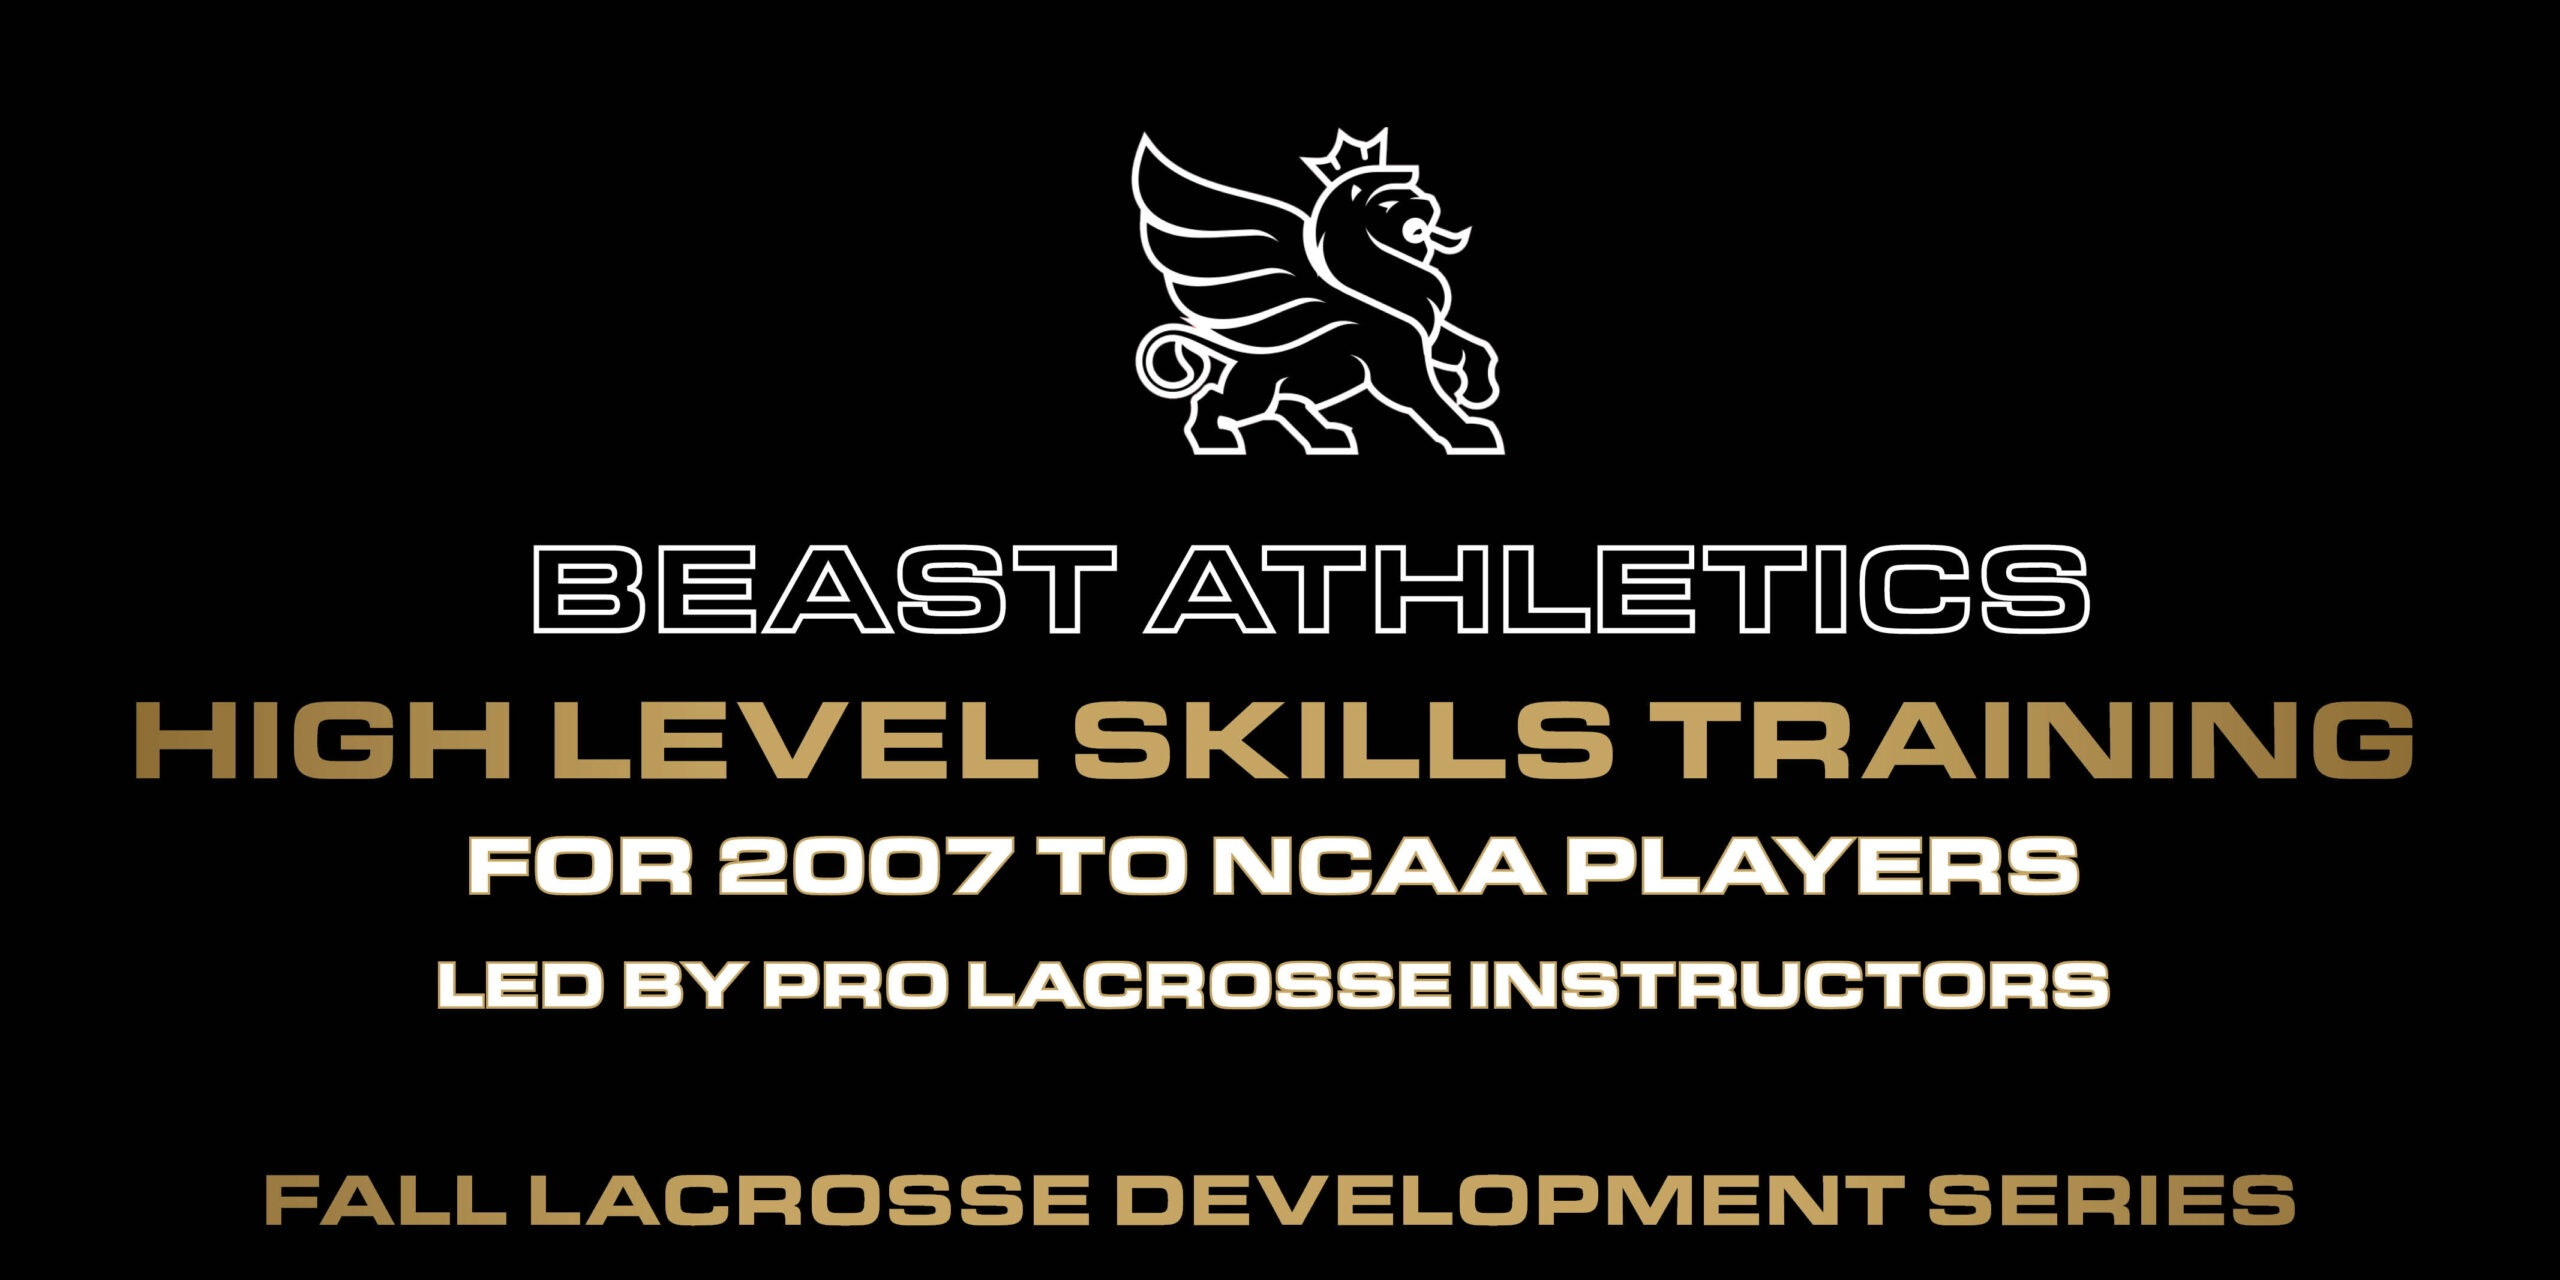 BEAST High level lacrosse training